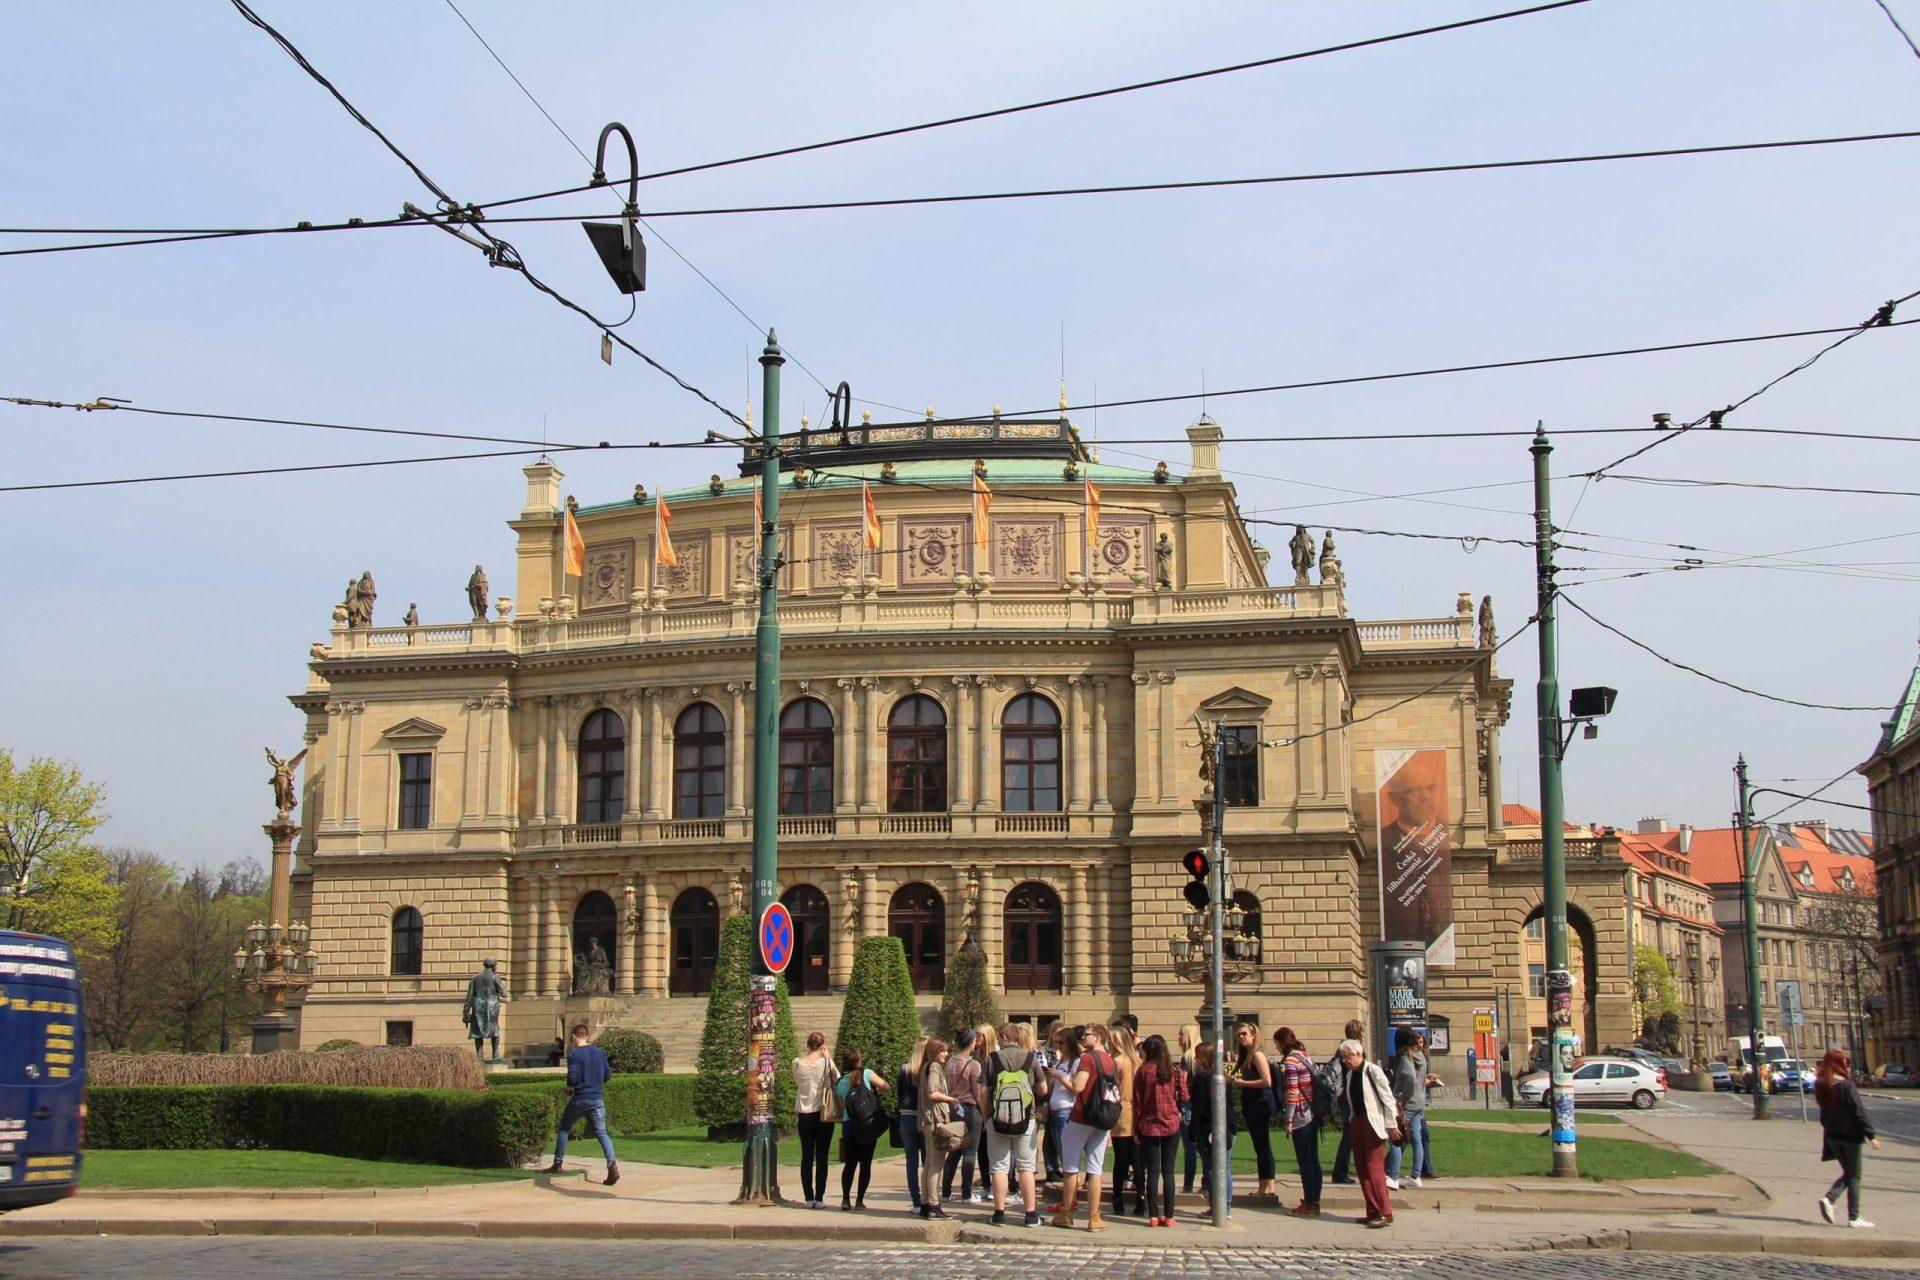 Рудольфинум, Прага, Чехия. Август, 2018